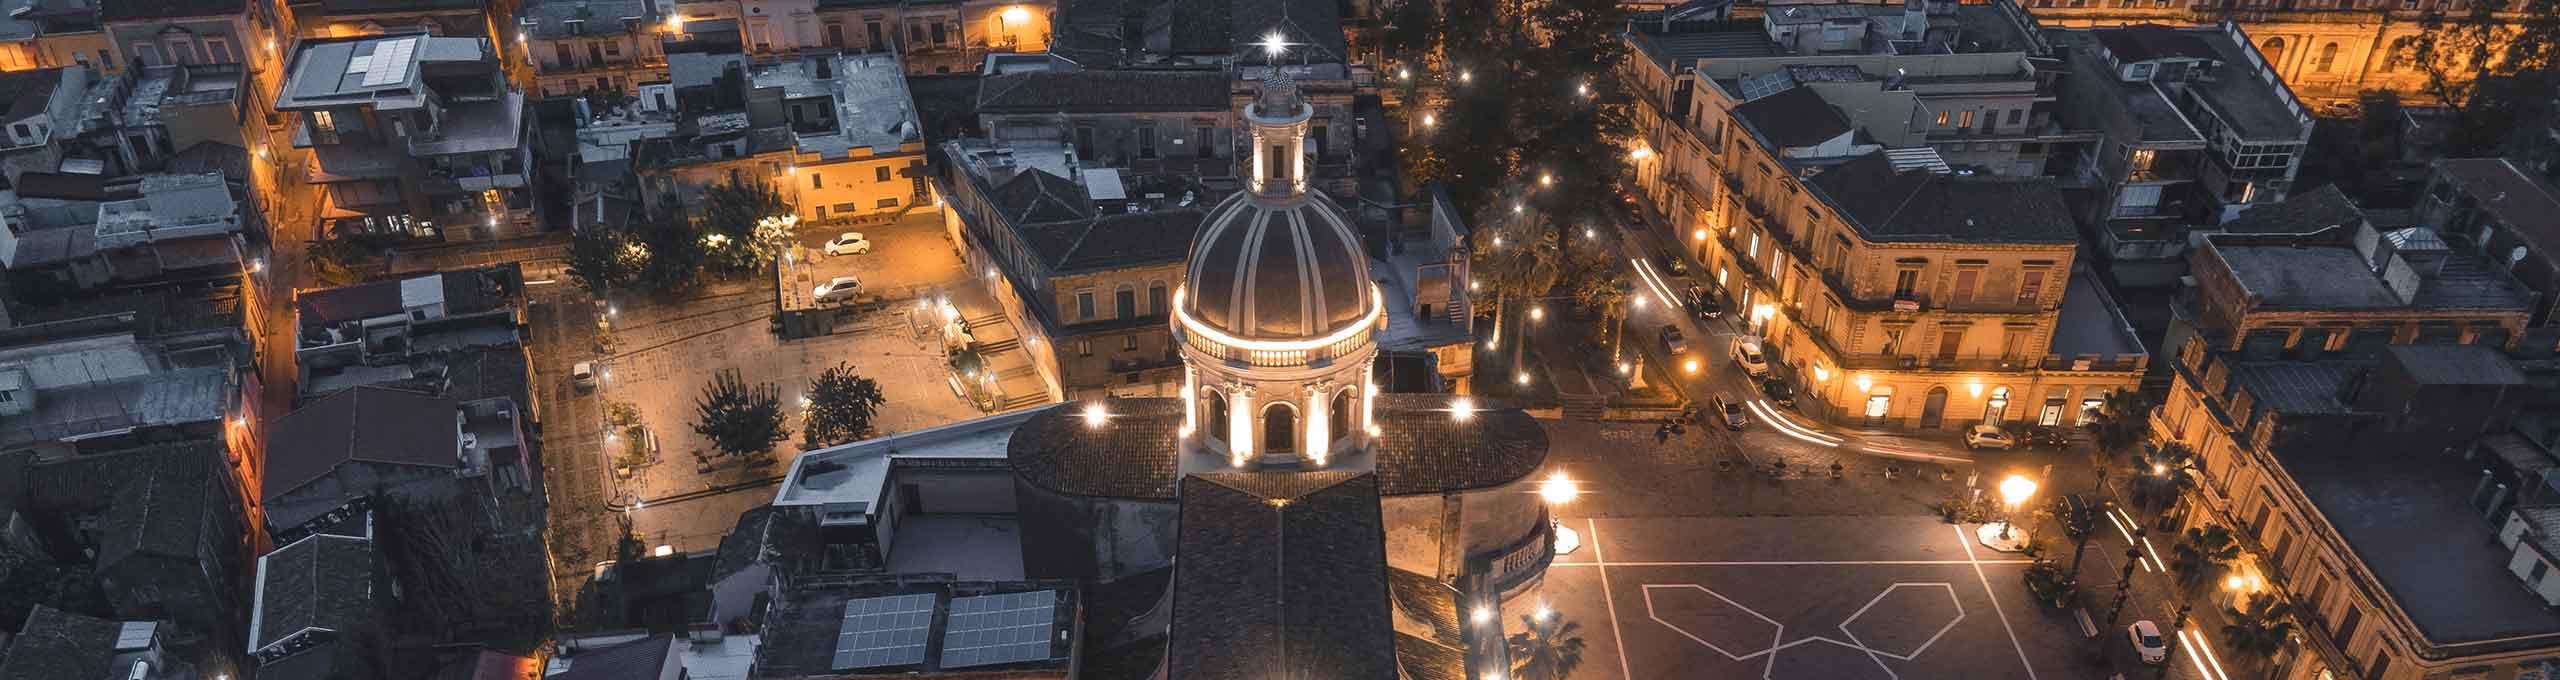 Chiesa di Sant Isidoro Agricola